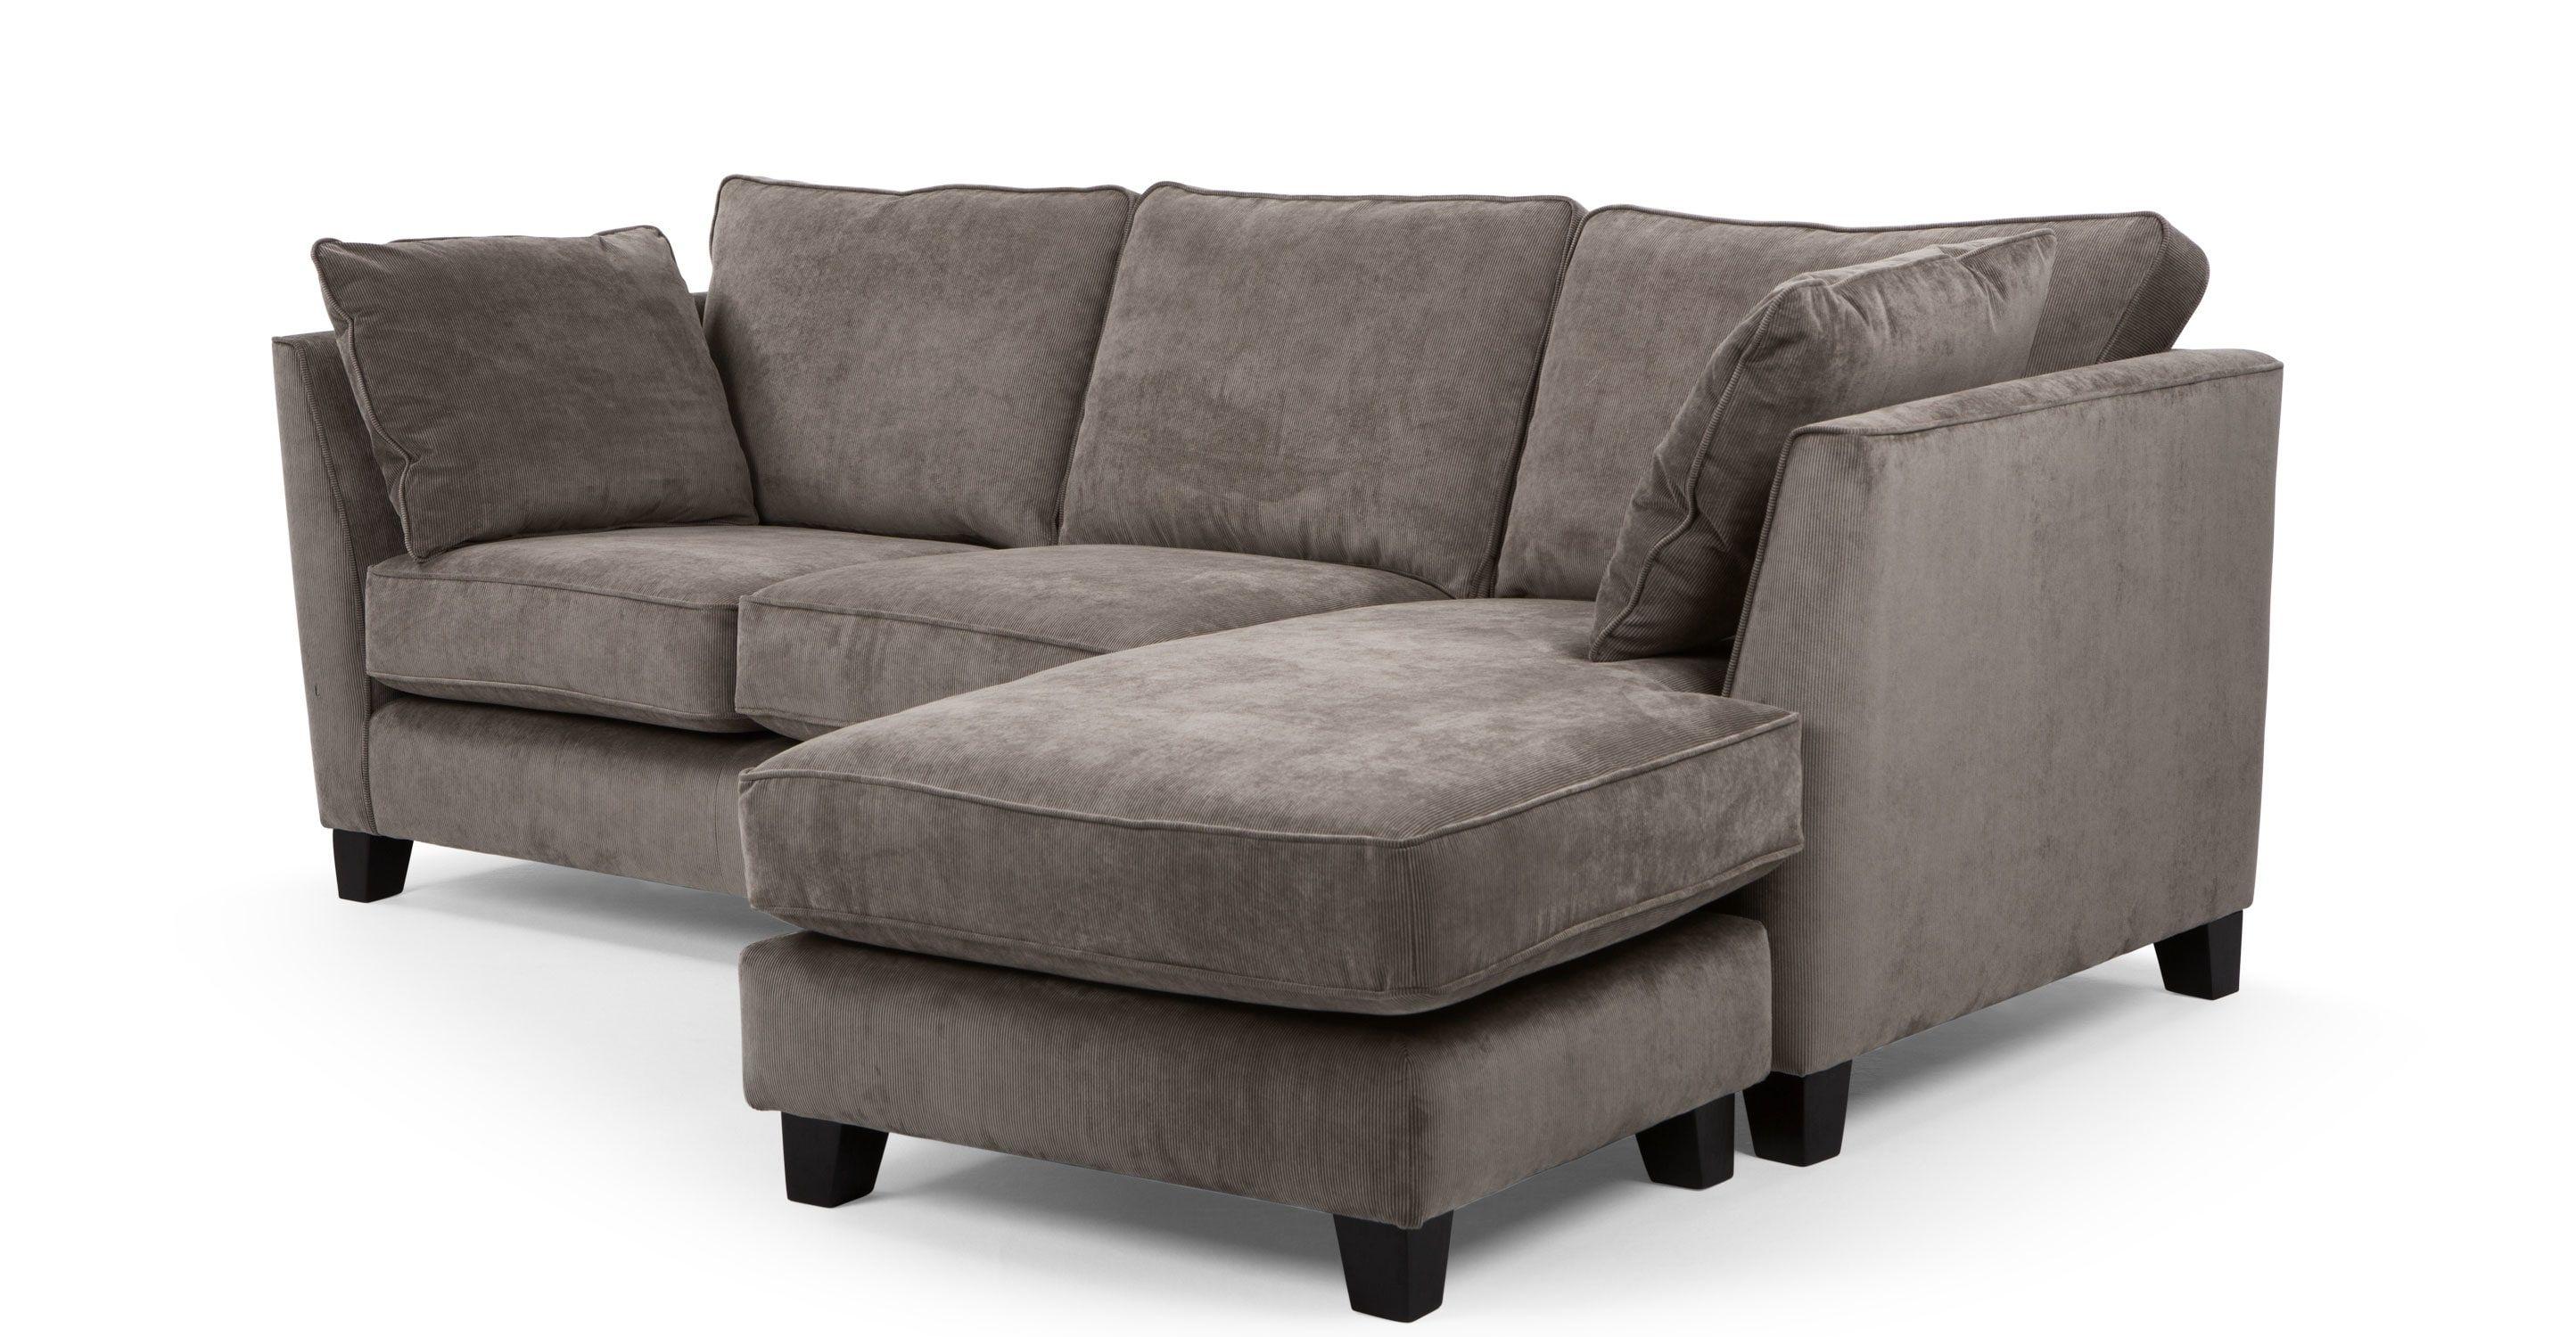 Wolseley Large Corner Sofa, Mid Grey Corduroy